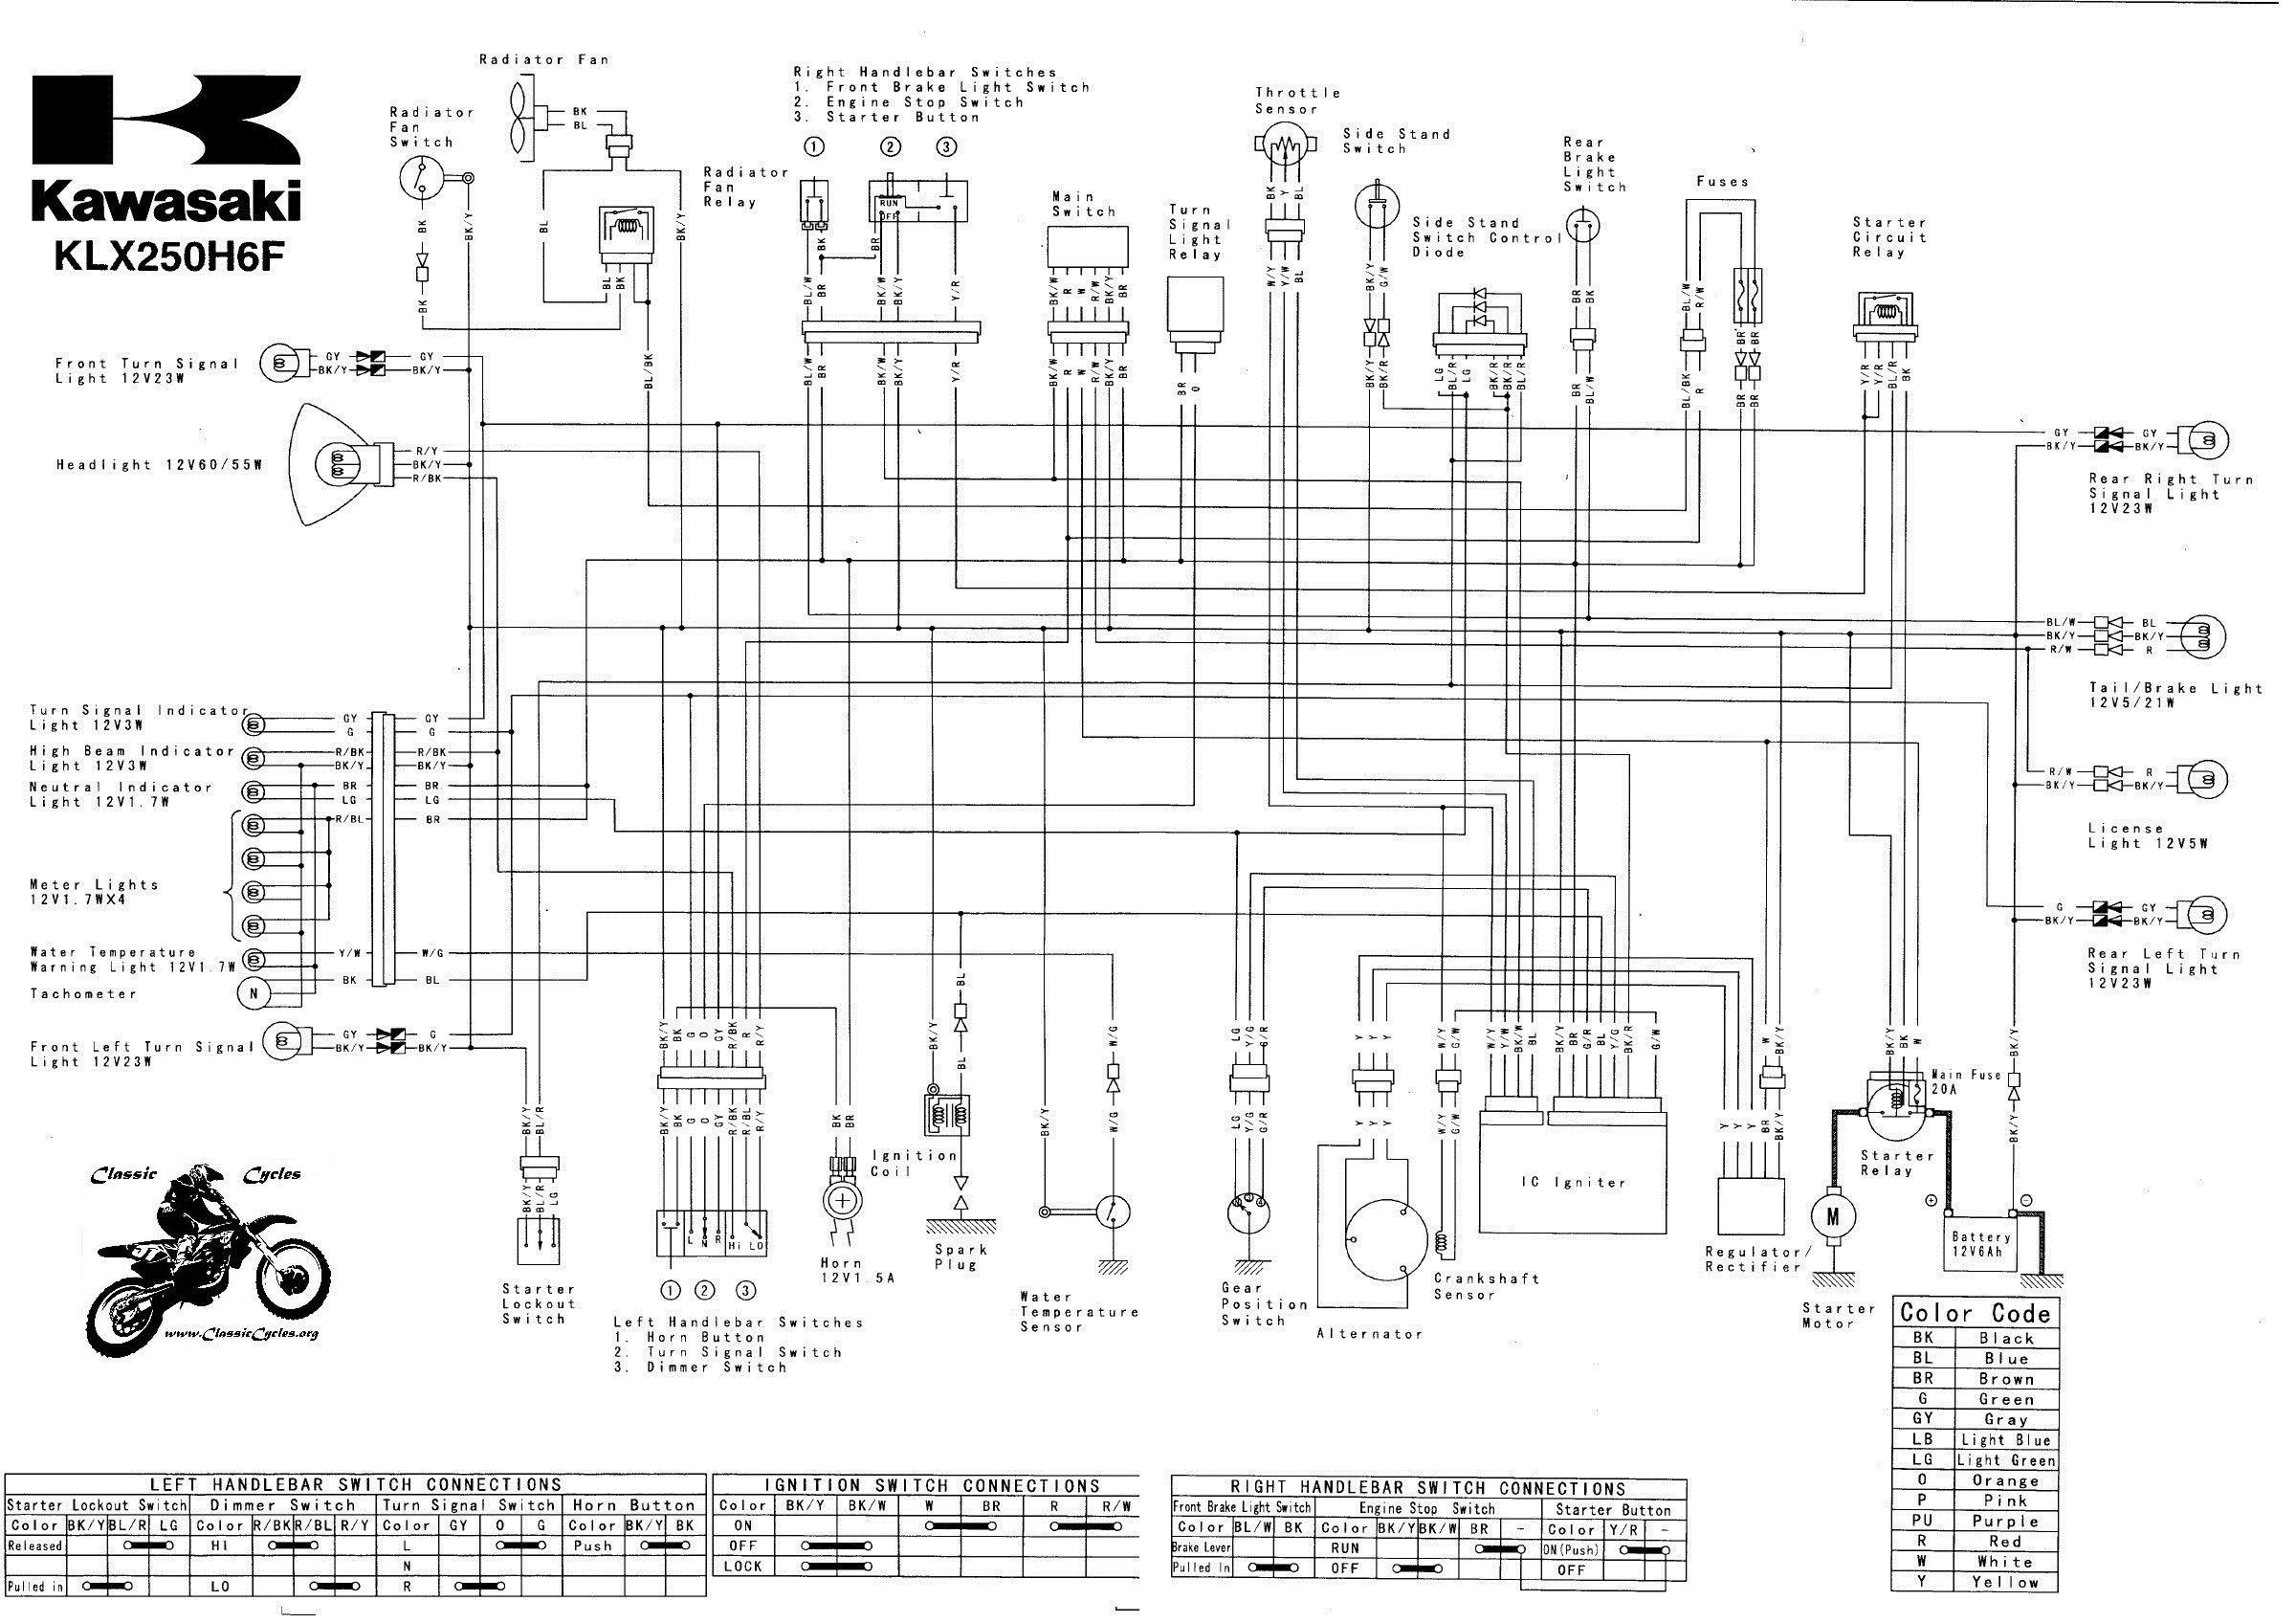 New Electrical Schematics Training Diagram Wiringdiagram